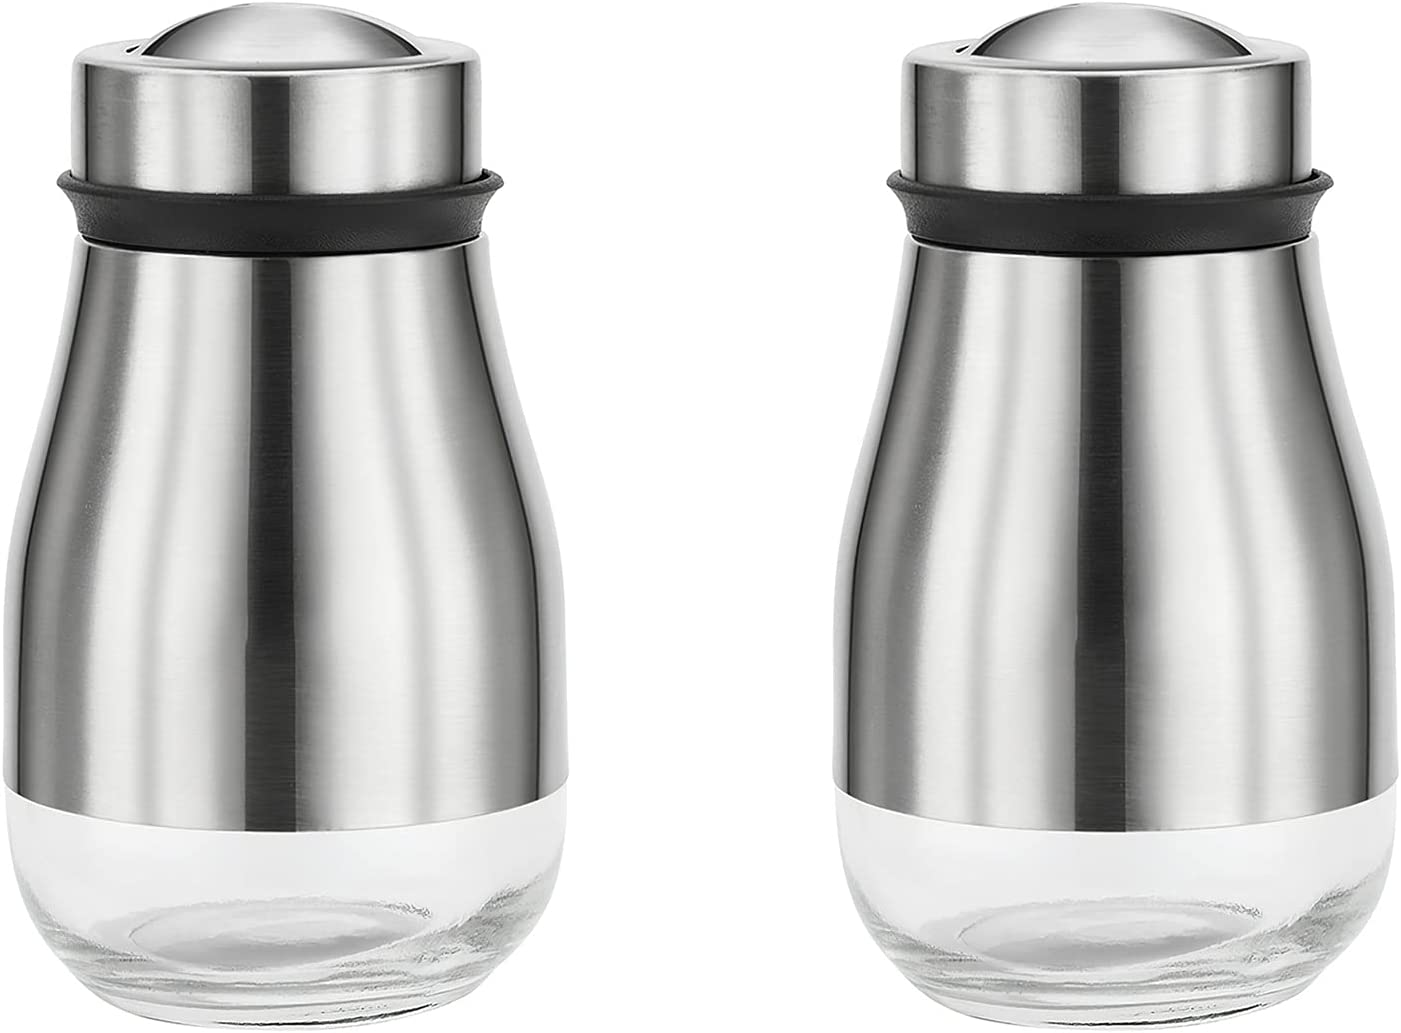 5 ☆ popular 2PCS Salt and Pepper Shakers Grinder 3 Adjustable Hol with trust